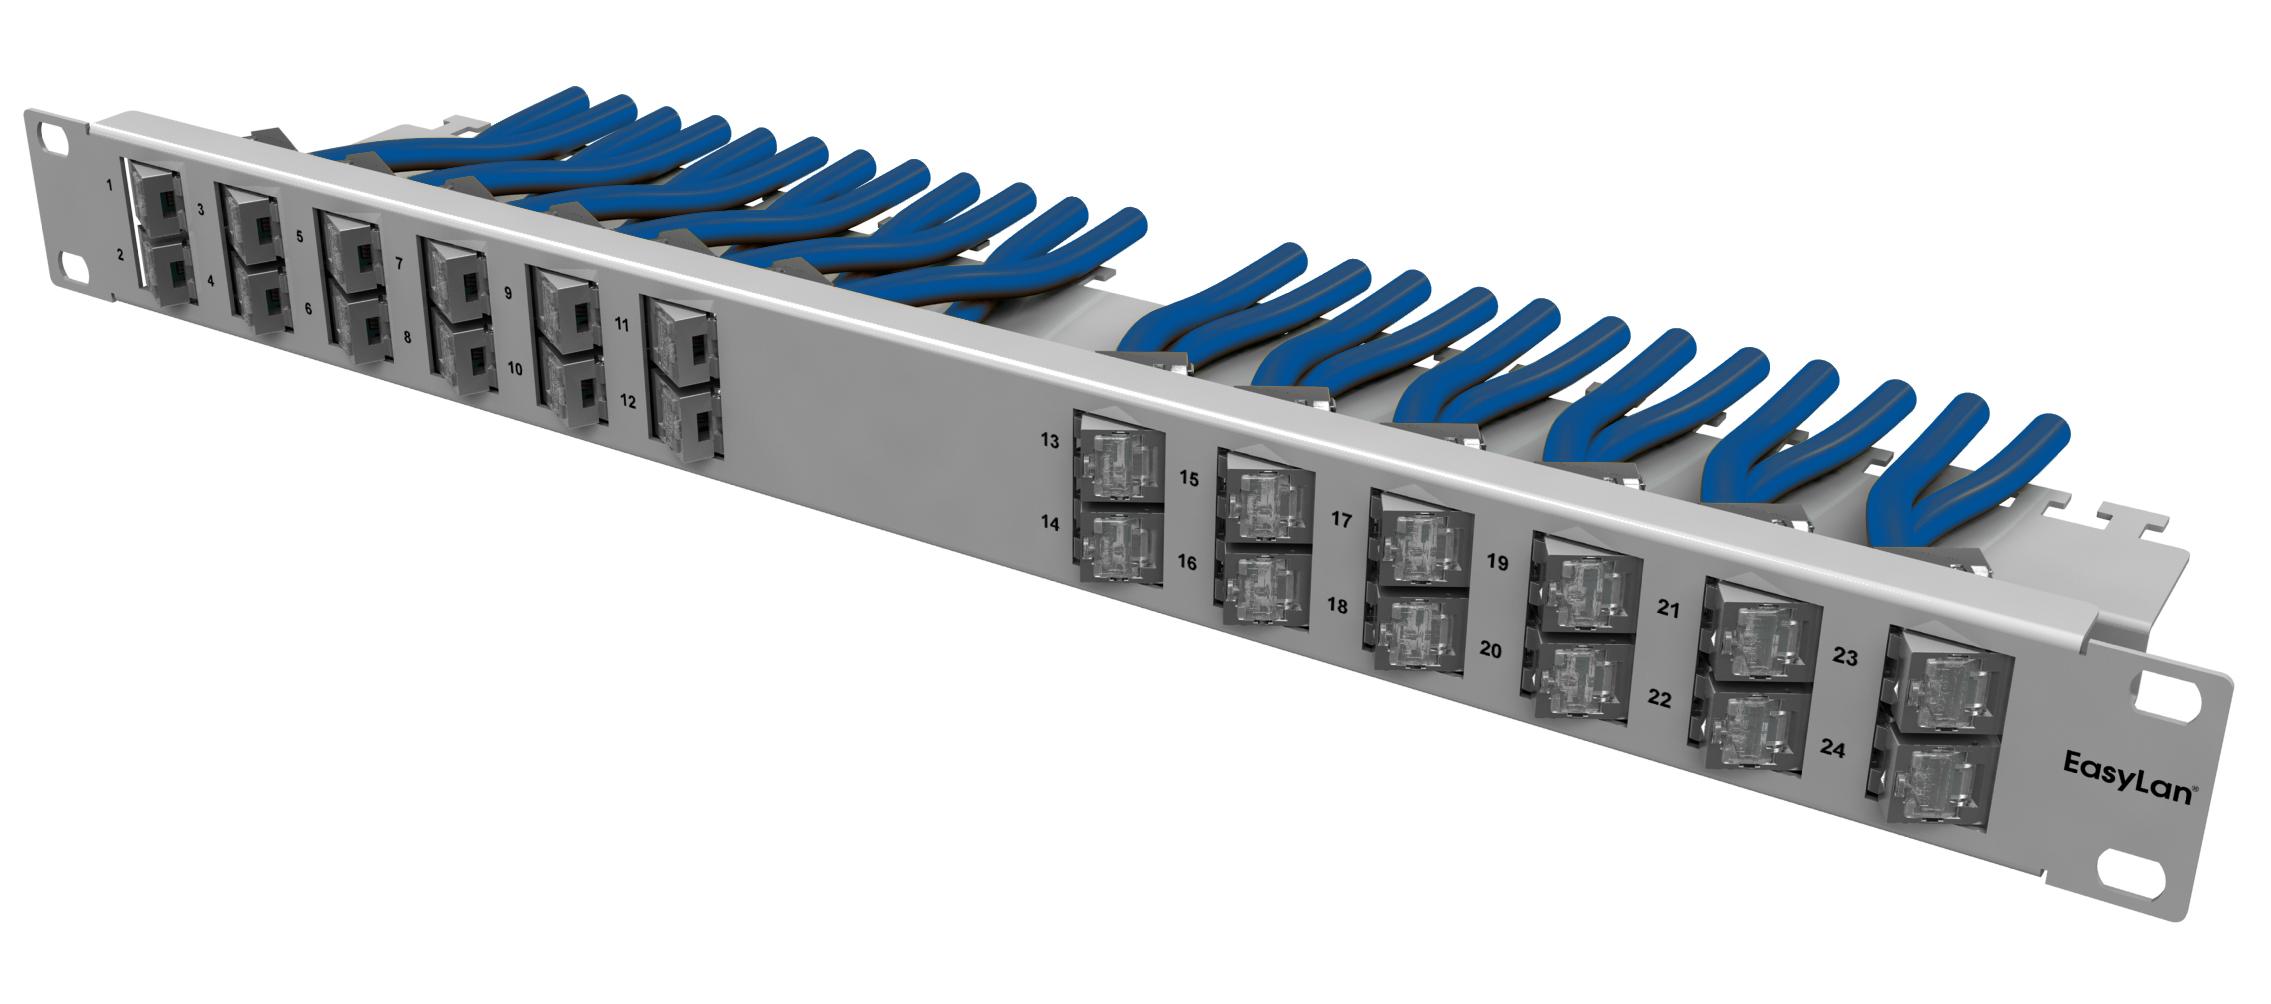 1 Stk preLink/fixLink Winkelpanel 1HE, 19, Variante 1 HEKR0240LR